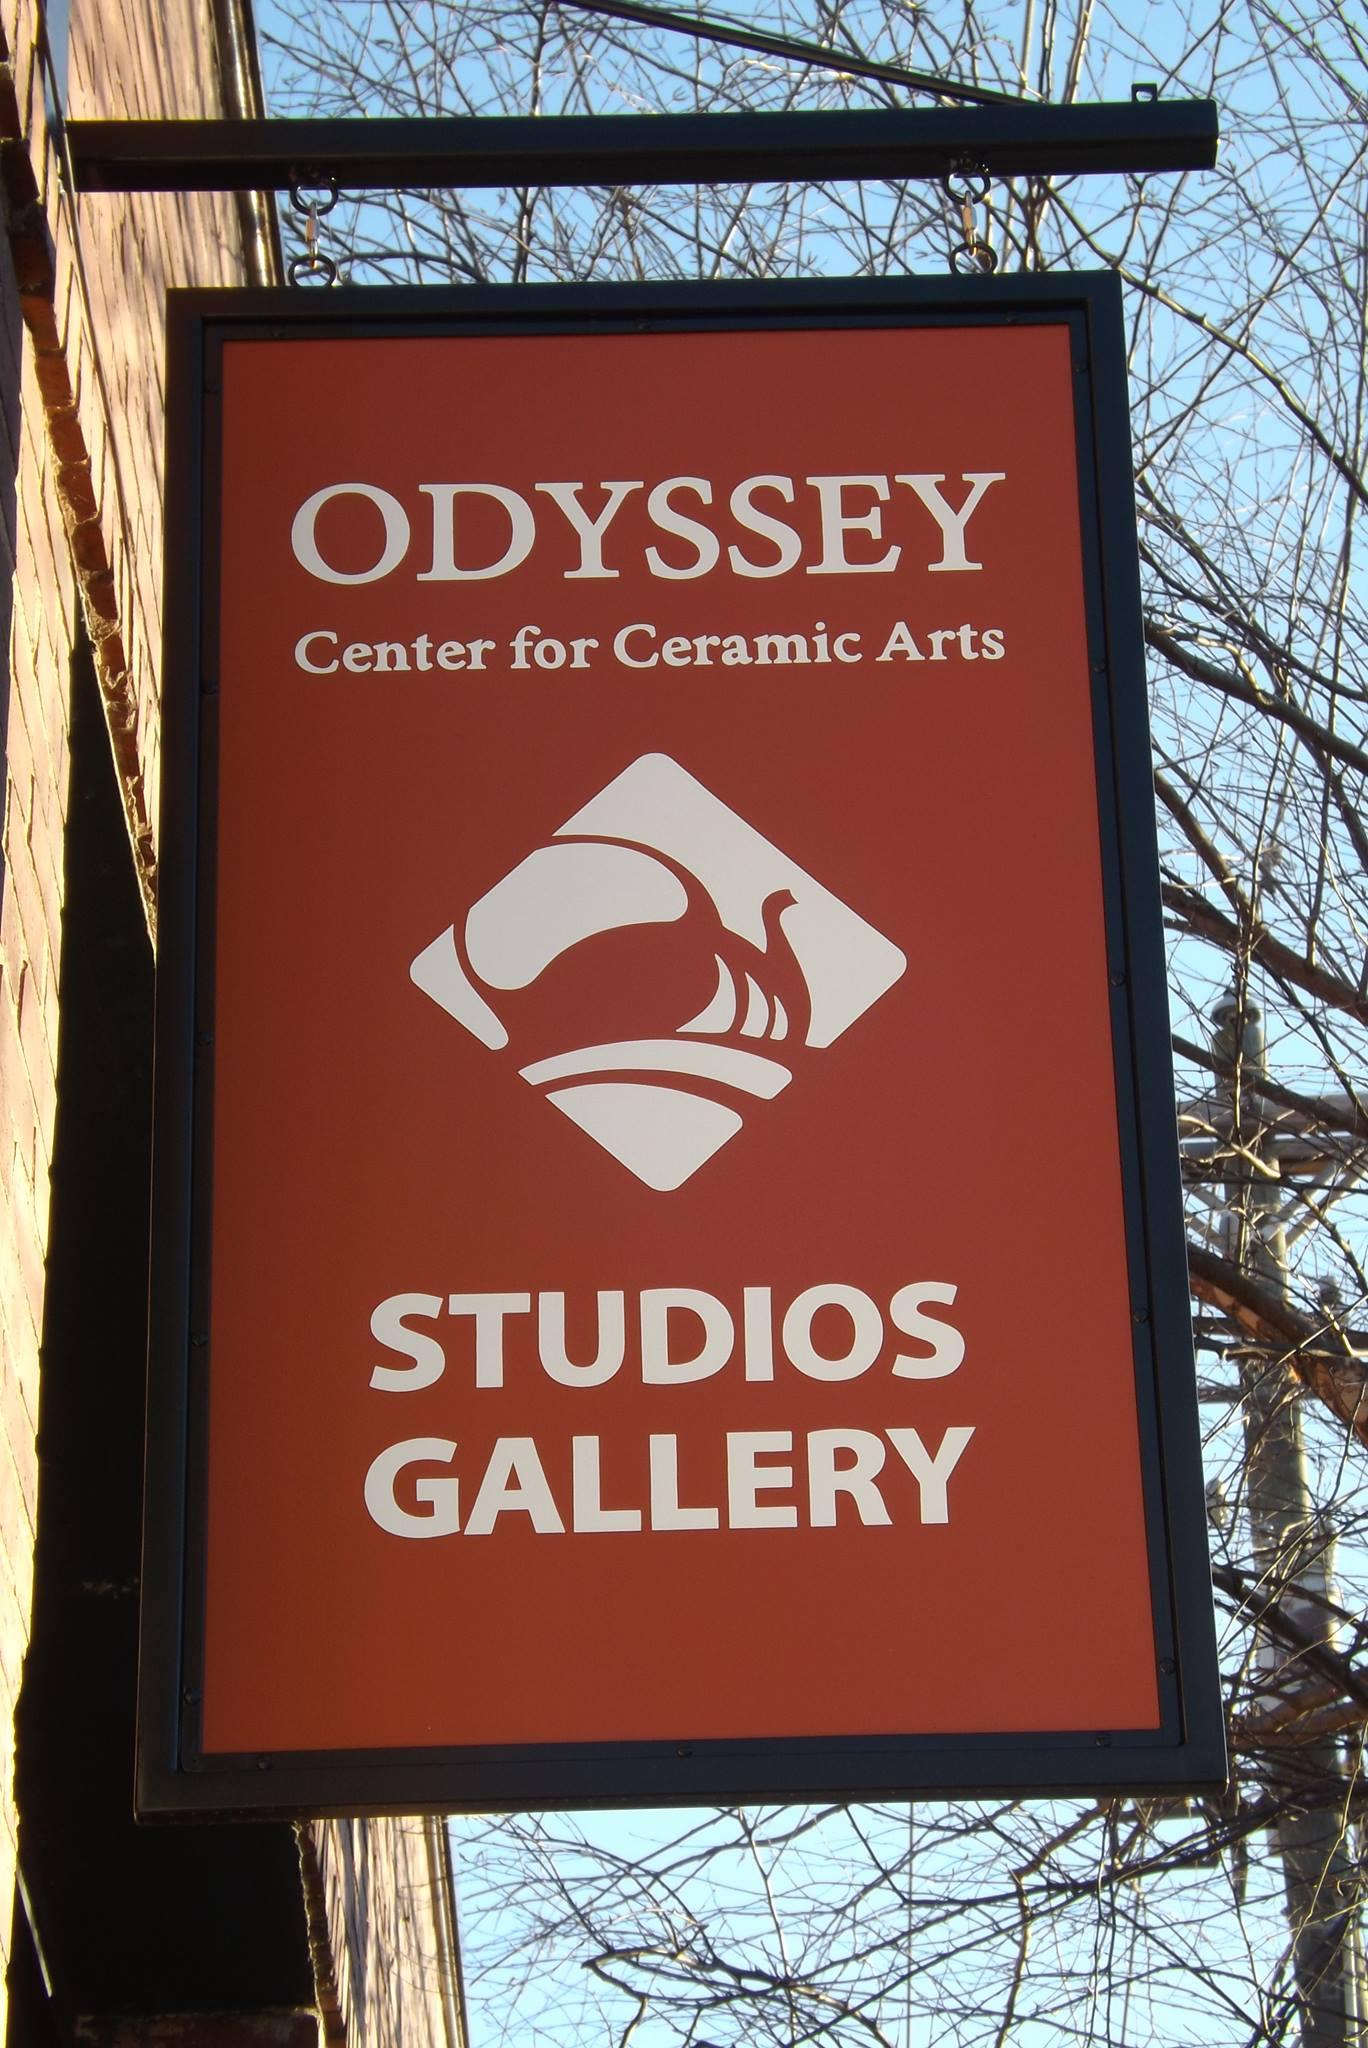 Odyssey co op gallery footer2 local flavor avl visit explore art scene asheville